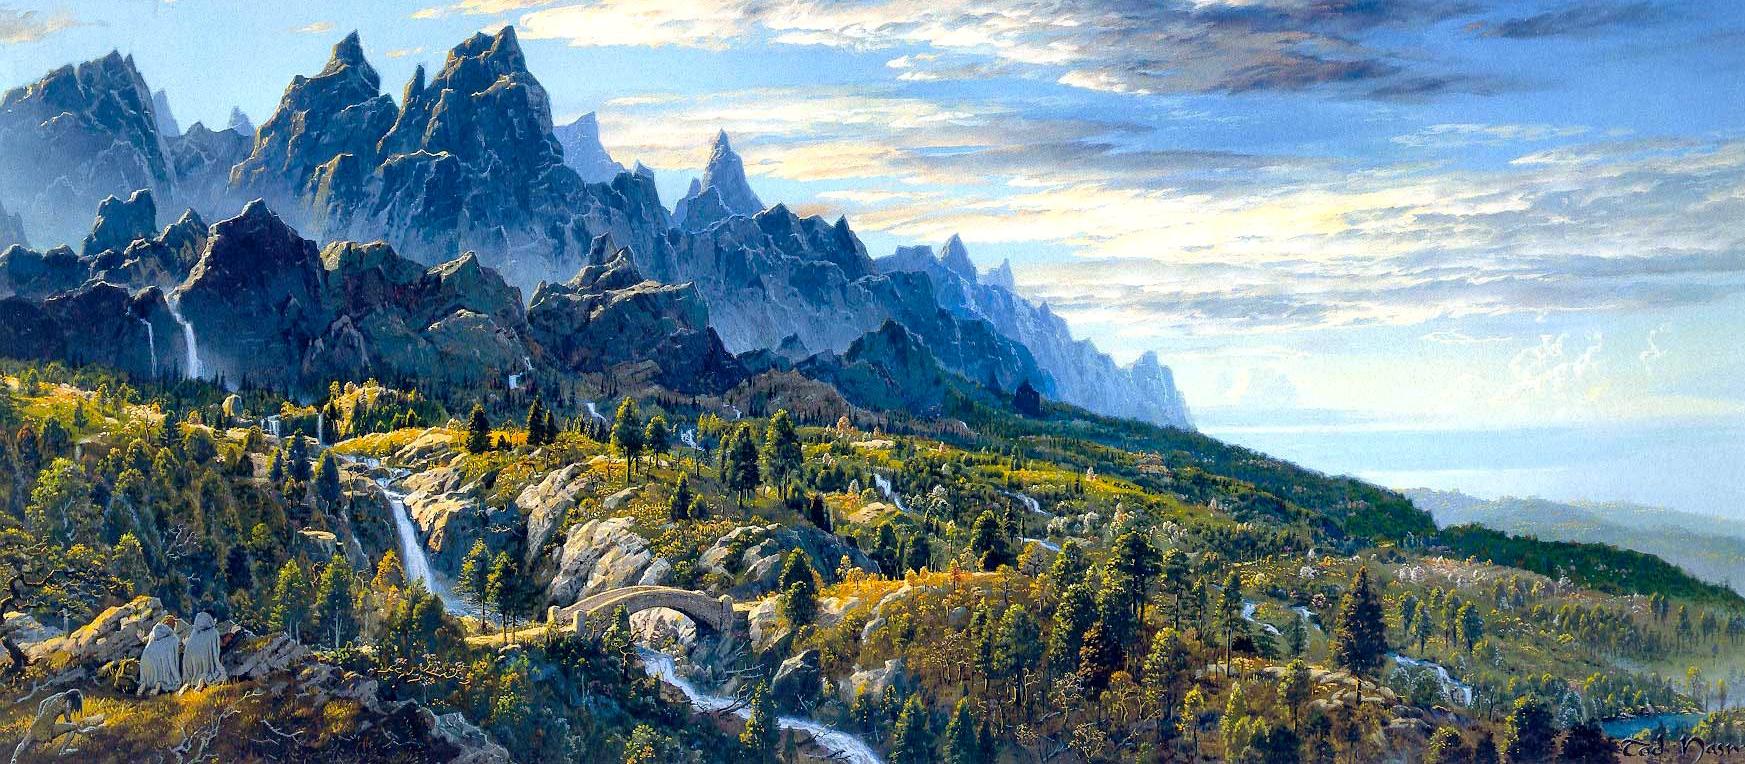 Lotr Fall Wallpaper Lewis Amp Tolkien Friendship A J Carlisle